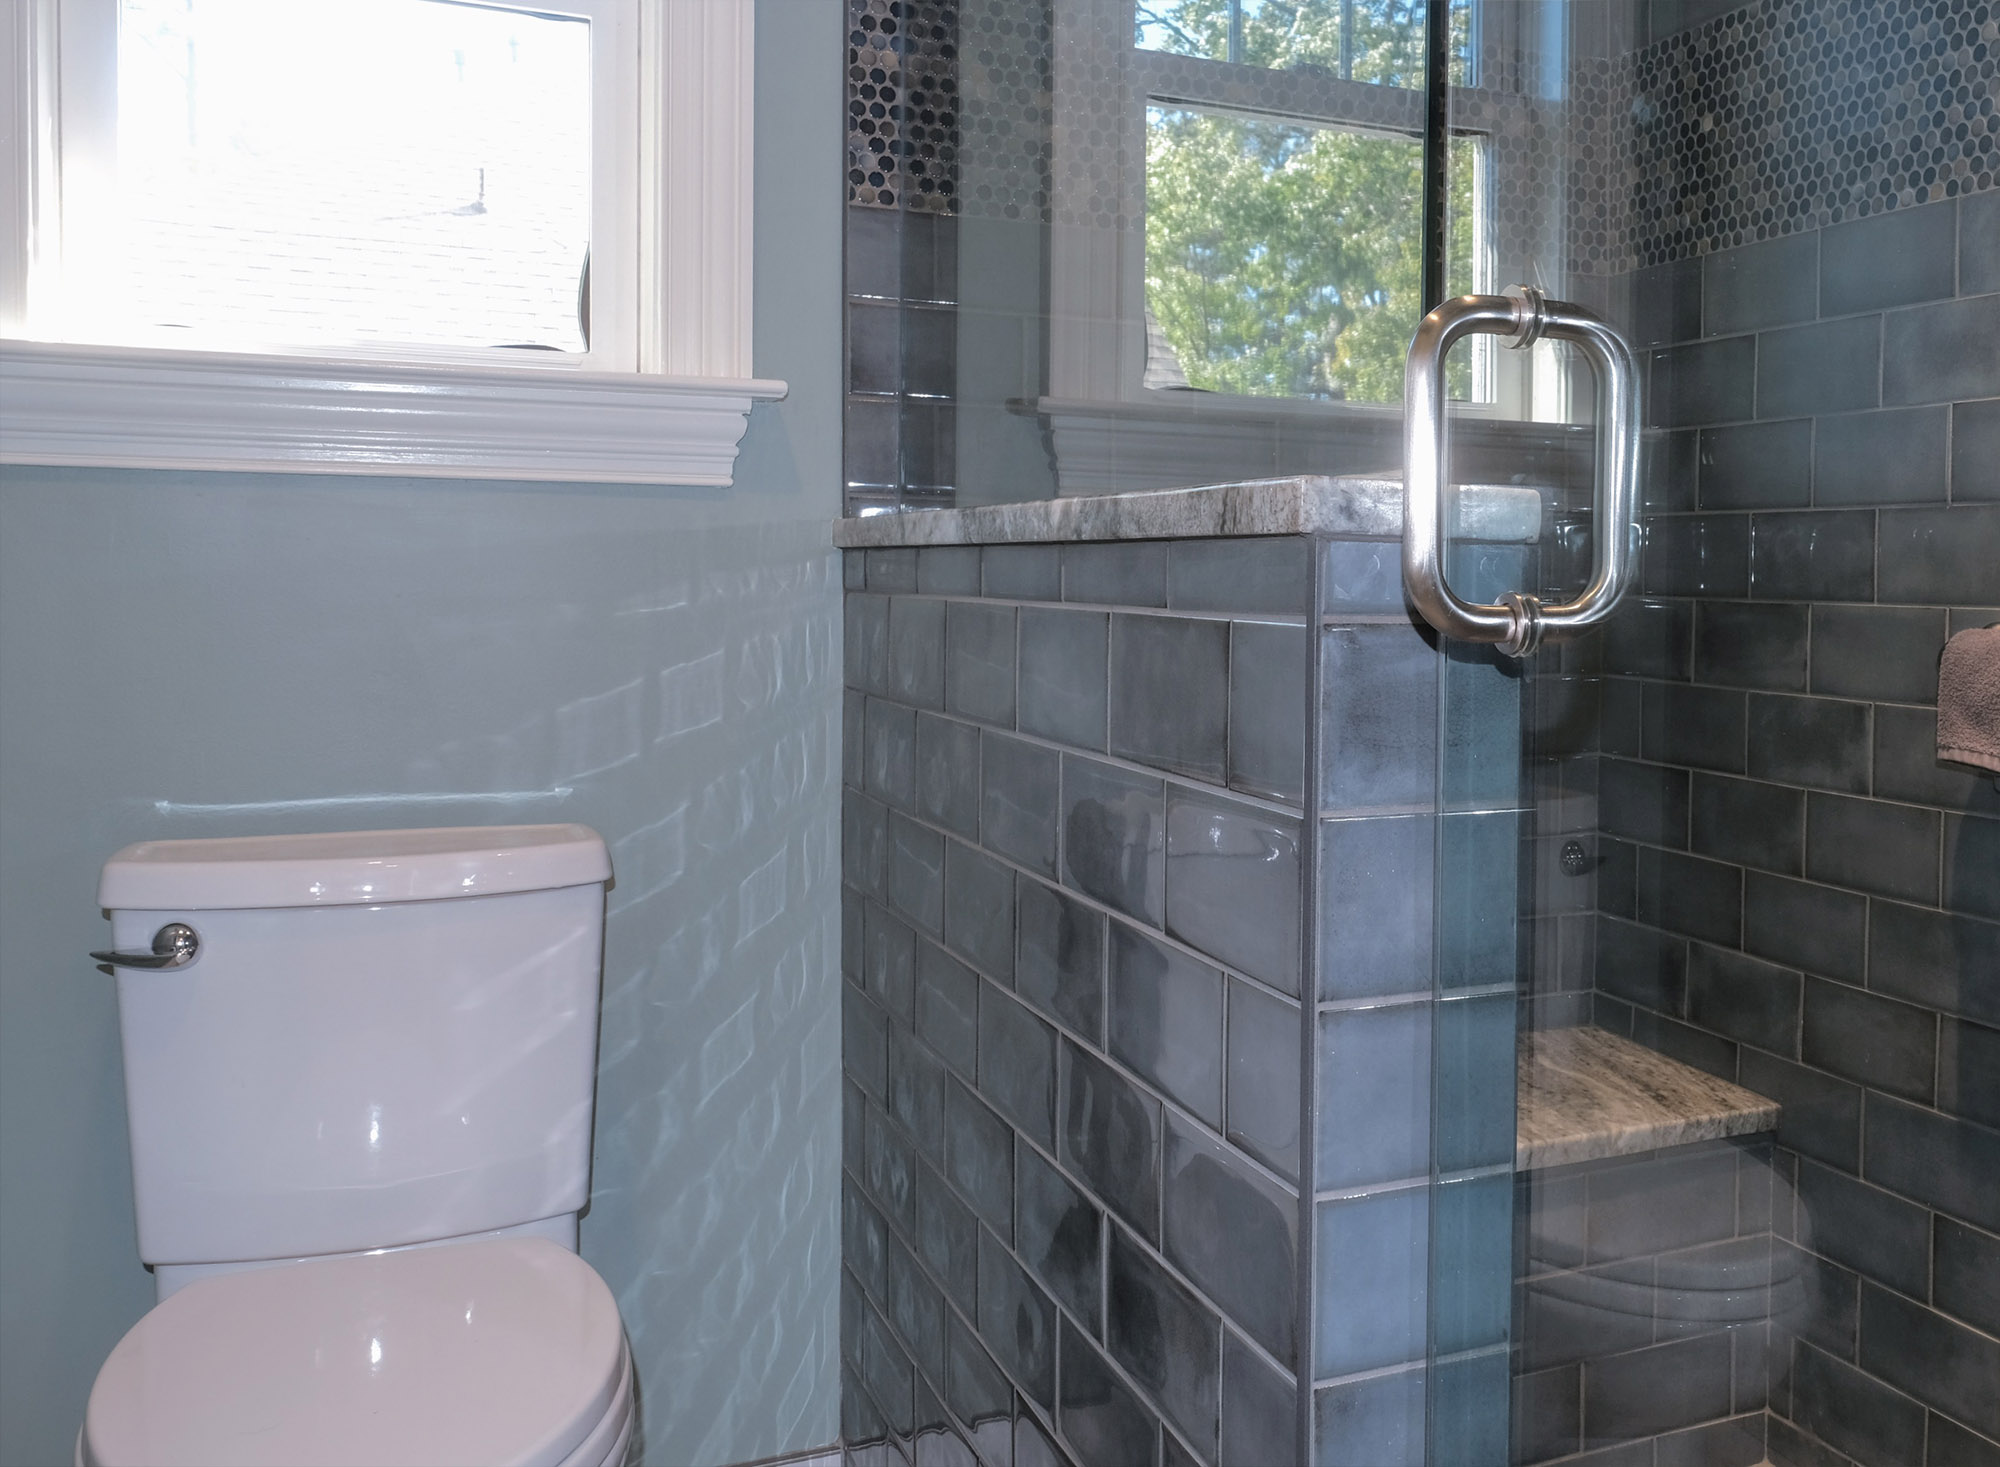 Hall Bath shower after photo